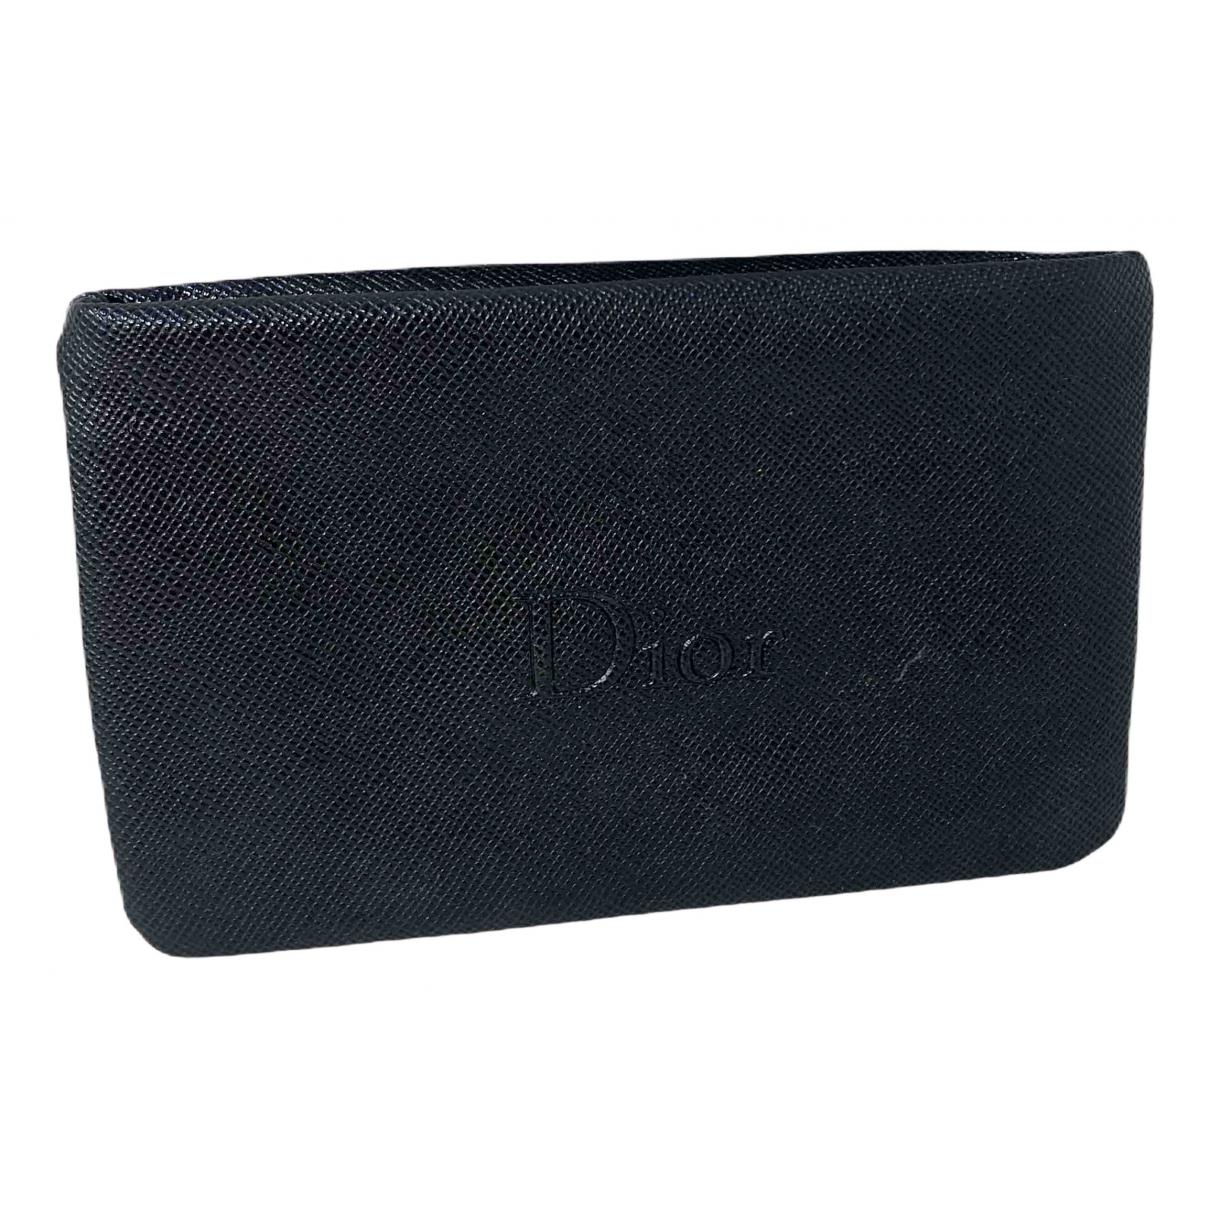 Dior N Black Clutch bag for Women N